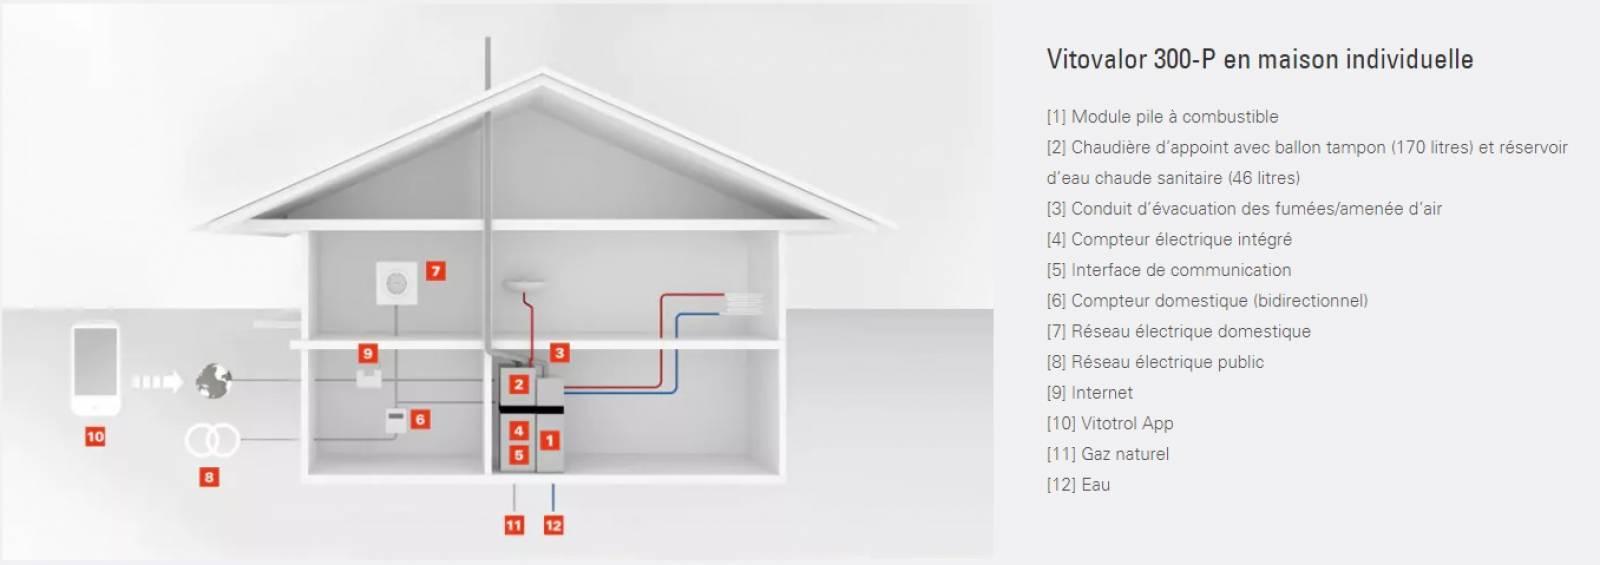 chaudi re gaz micro cog n ration pile combustible lillebonne caux seine agglo. Black Bedroom Furniture Sets. Home Design Ideas